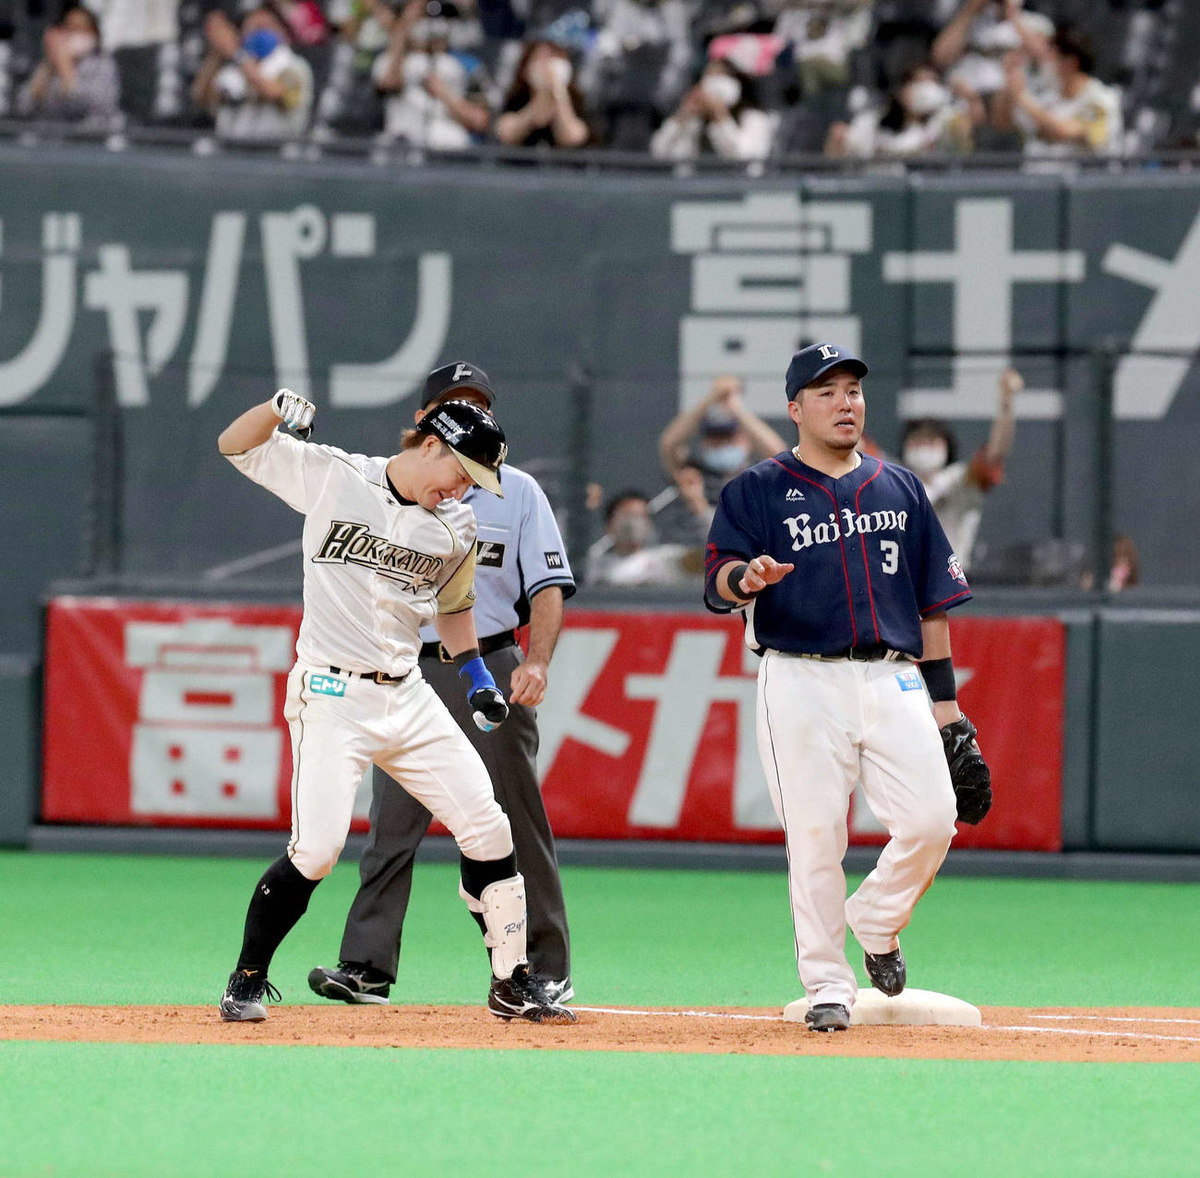 f:id:AriharaOkoku:20200809224426j:plain